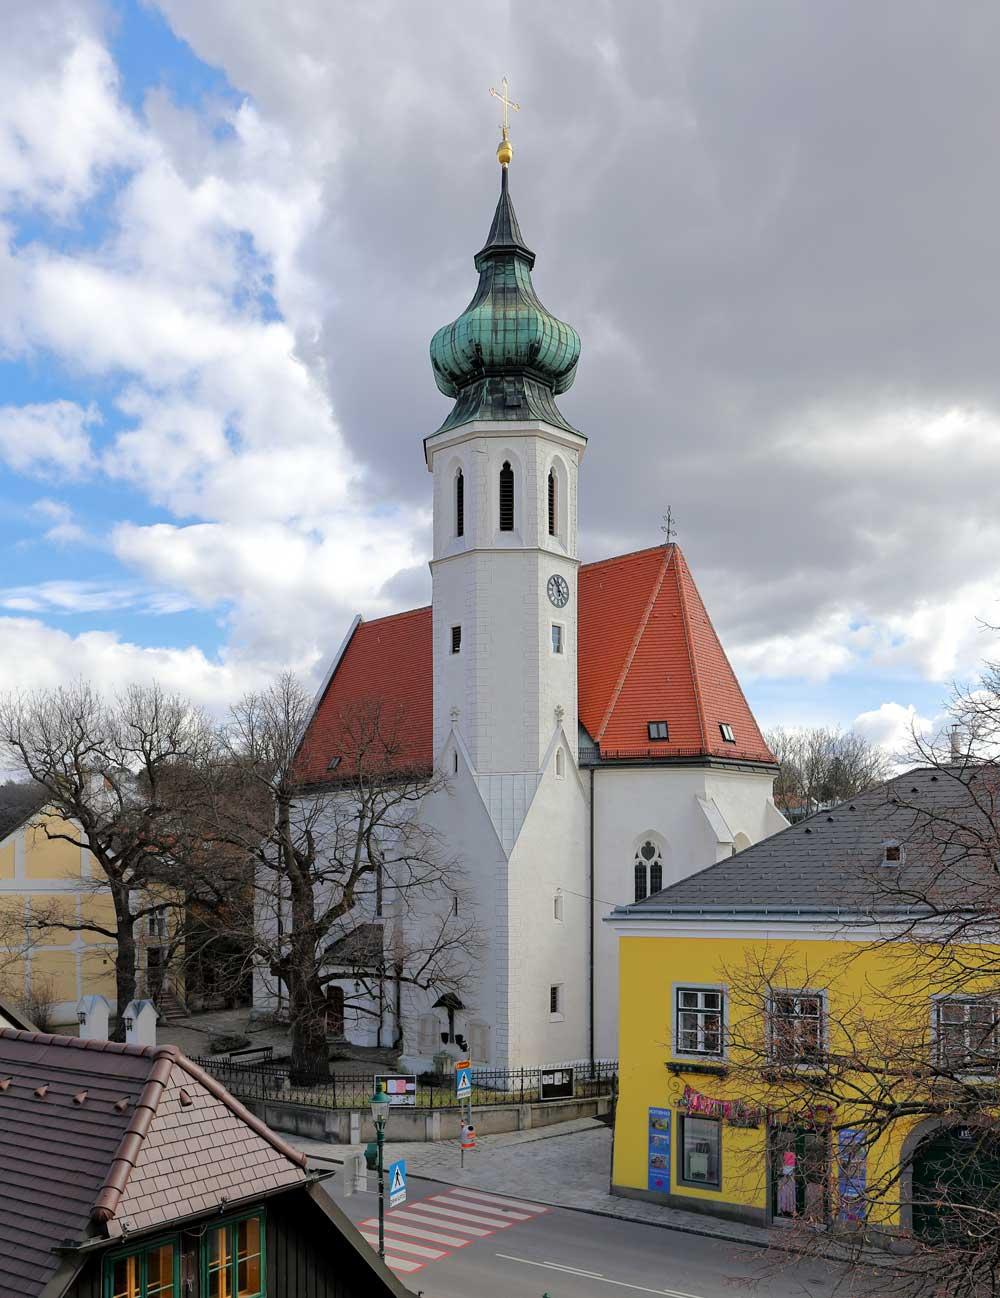 Pfarrkirche Grinzing